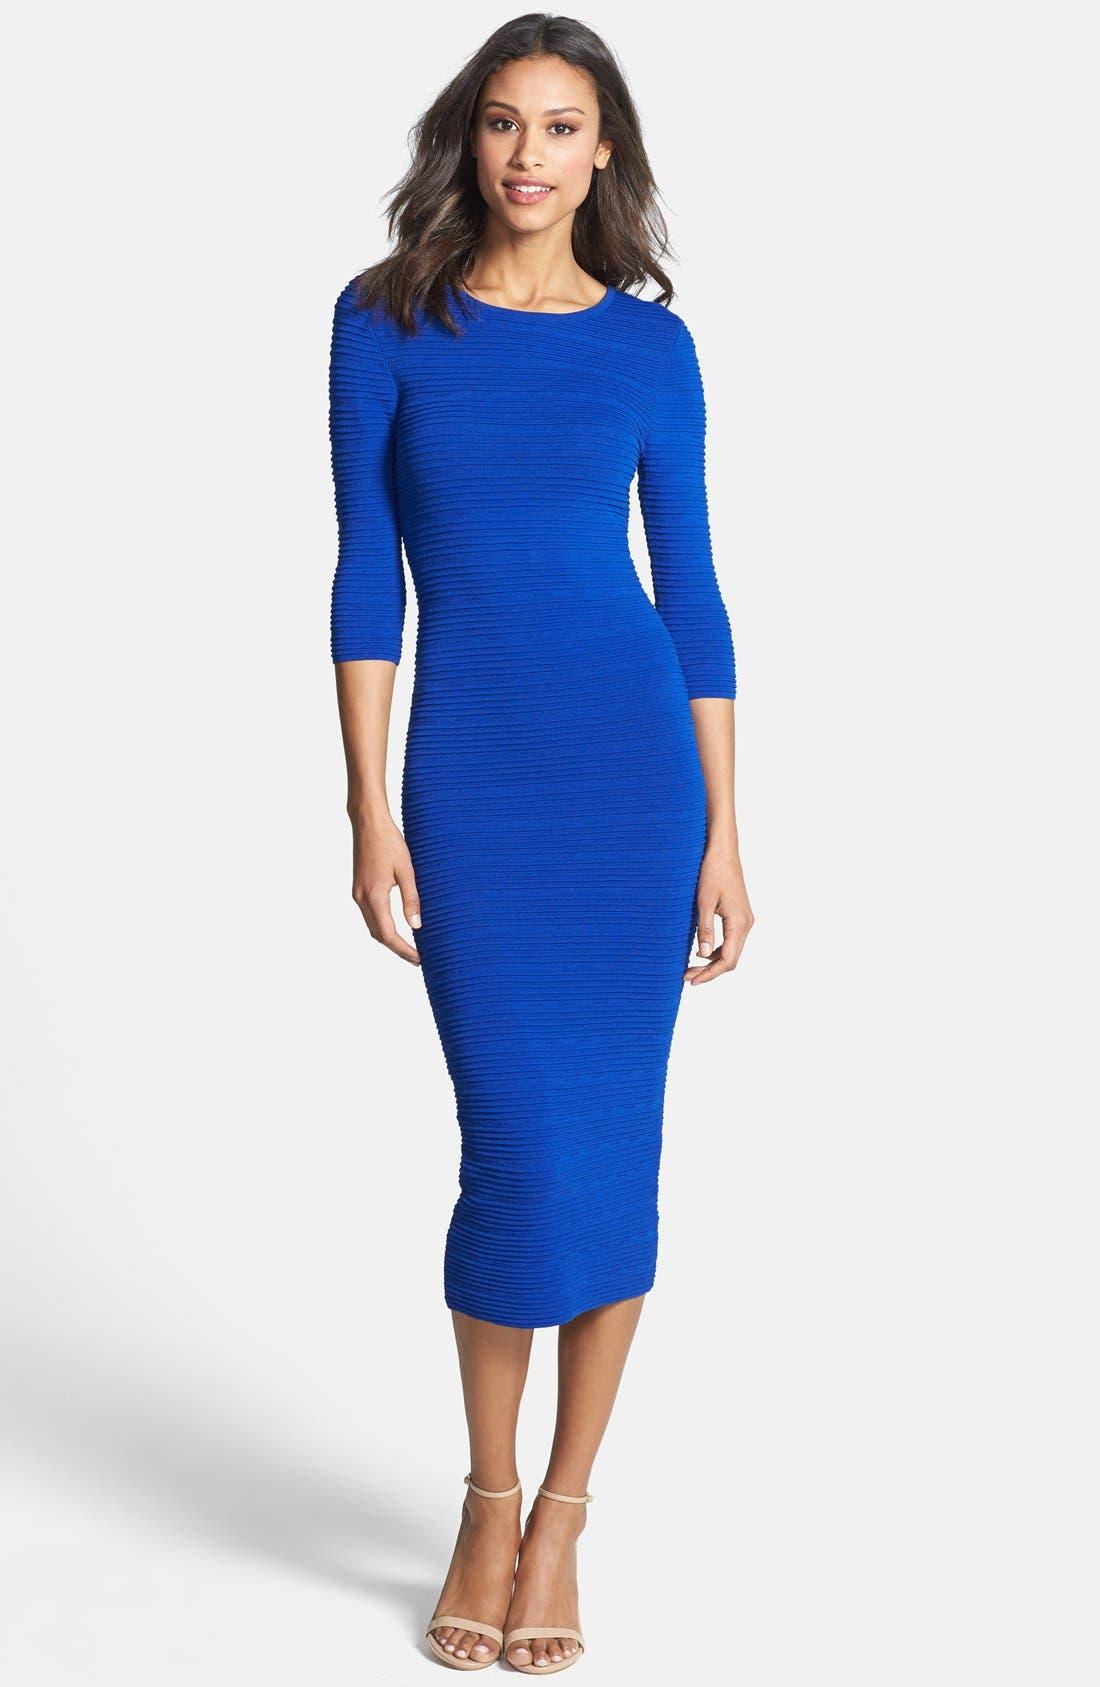 Main Image - Felicity & Coco Knit Body-Con Midi Dress (Nordstrom Exclusive)